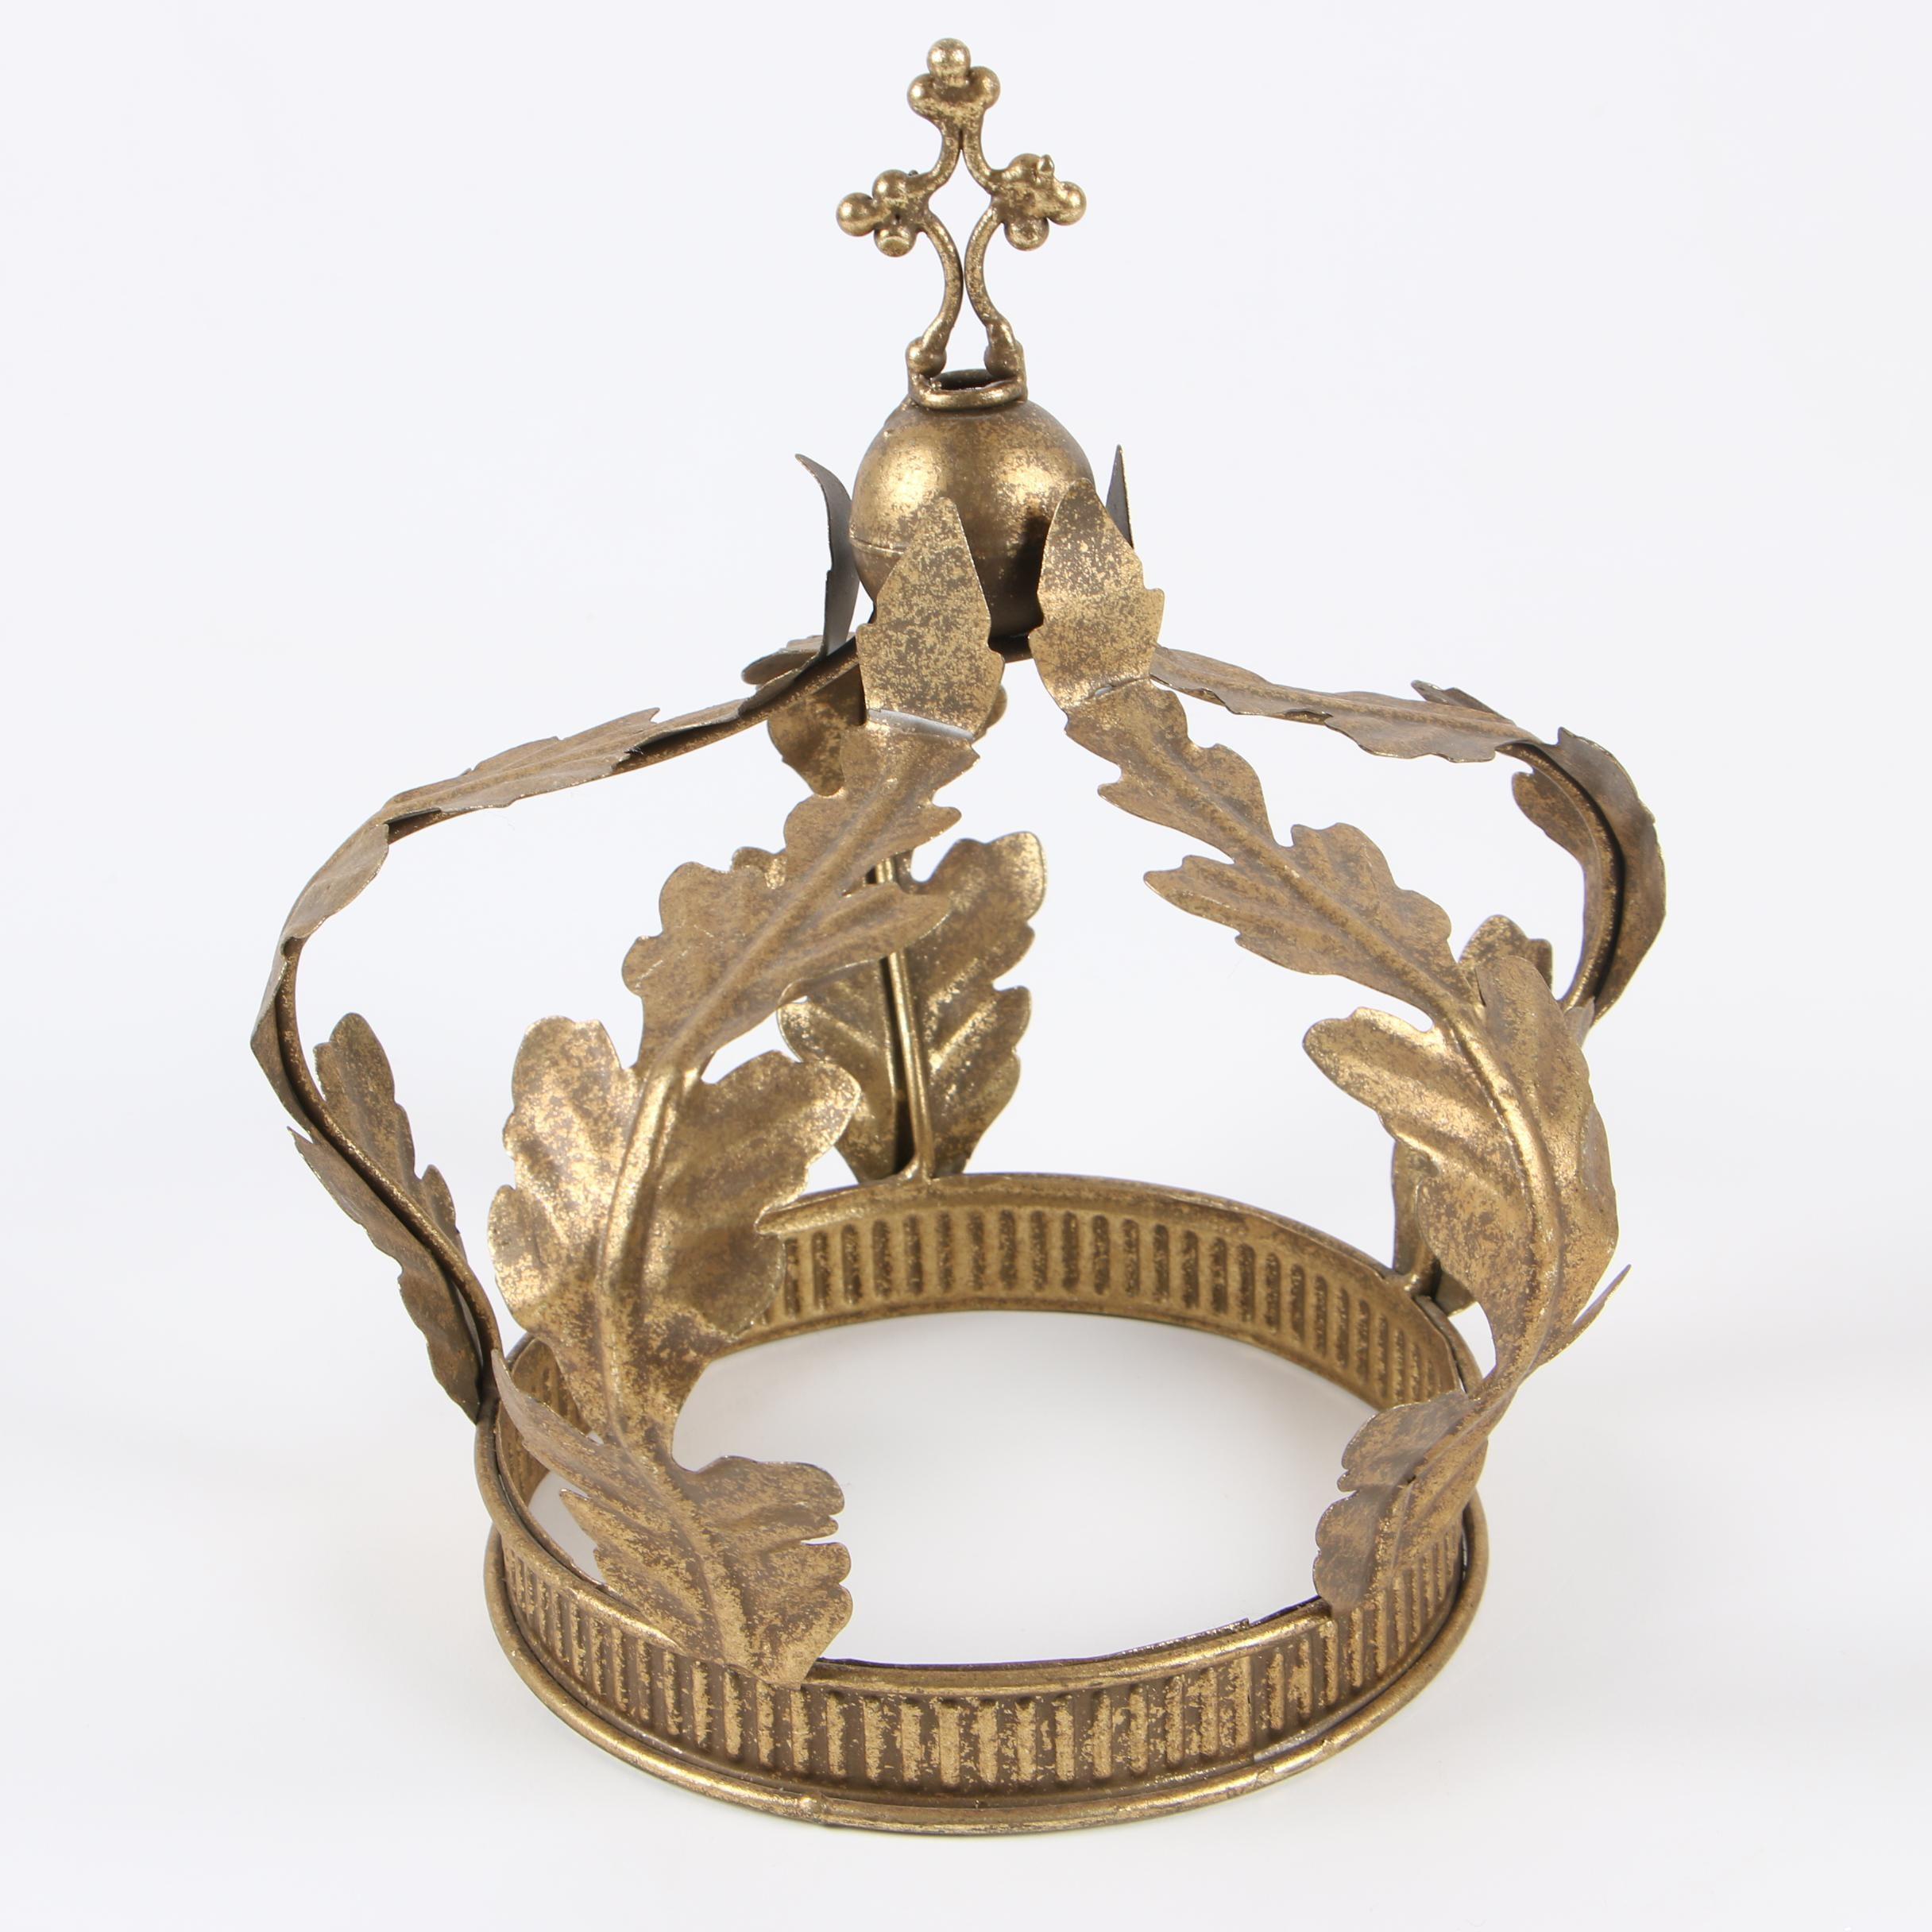 Decorative Gilt Metal Royal Crown